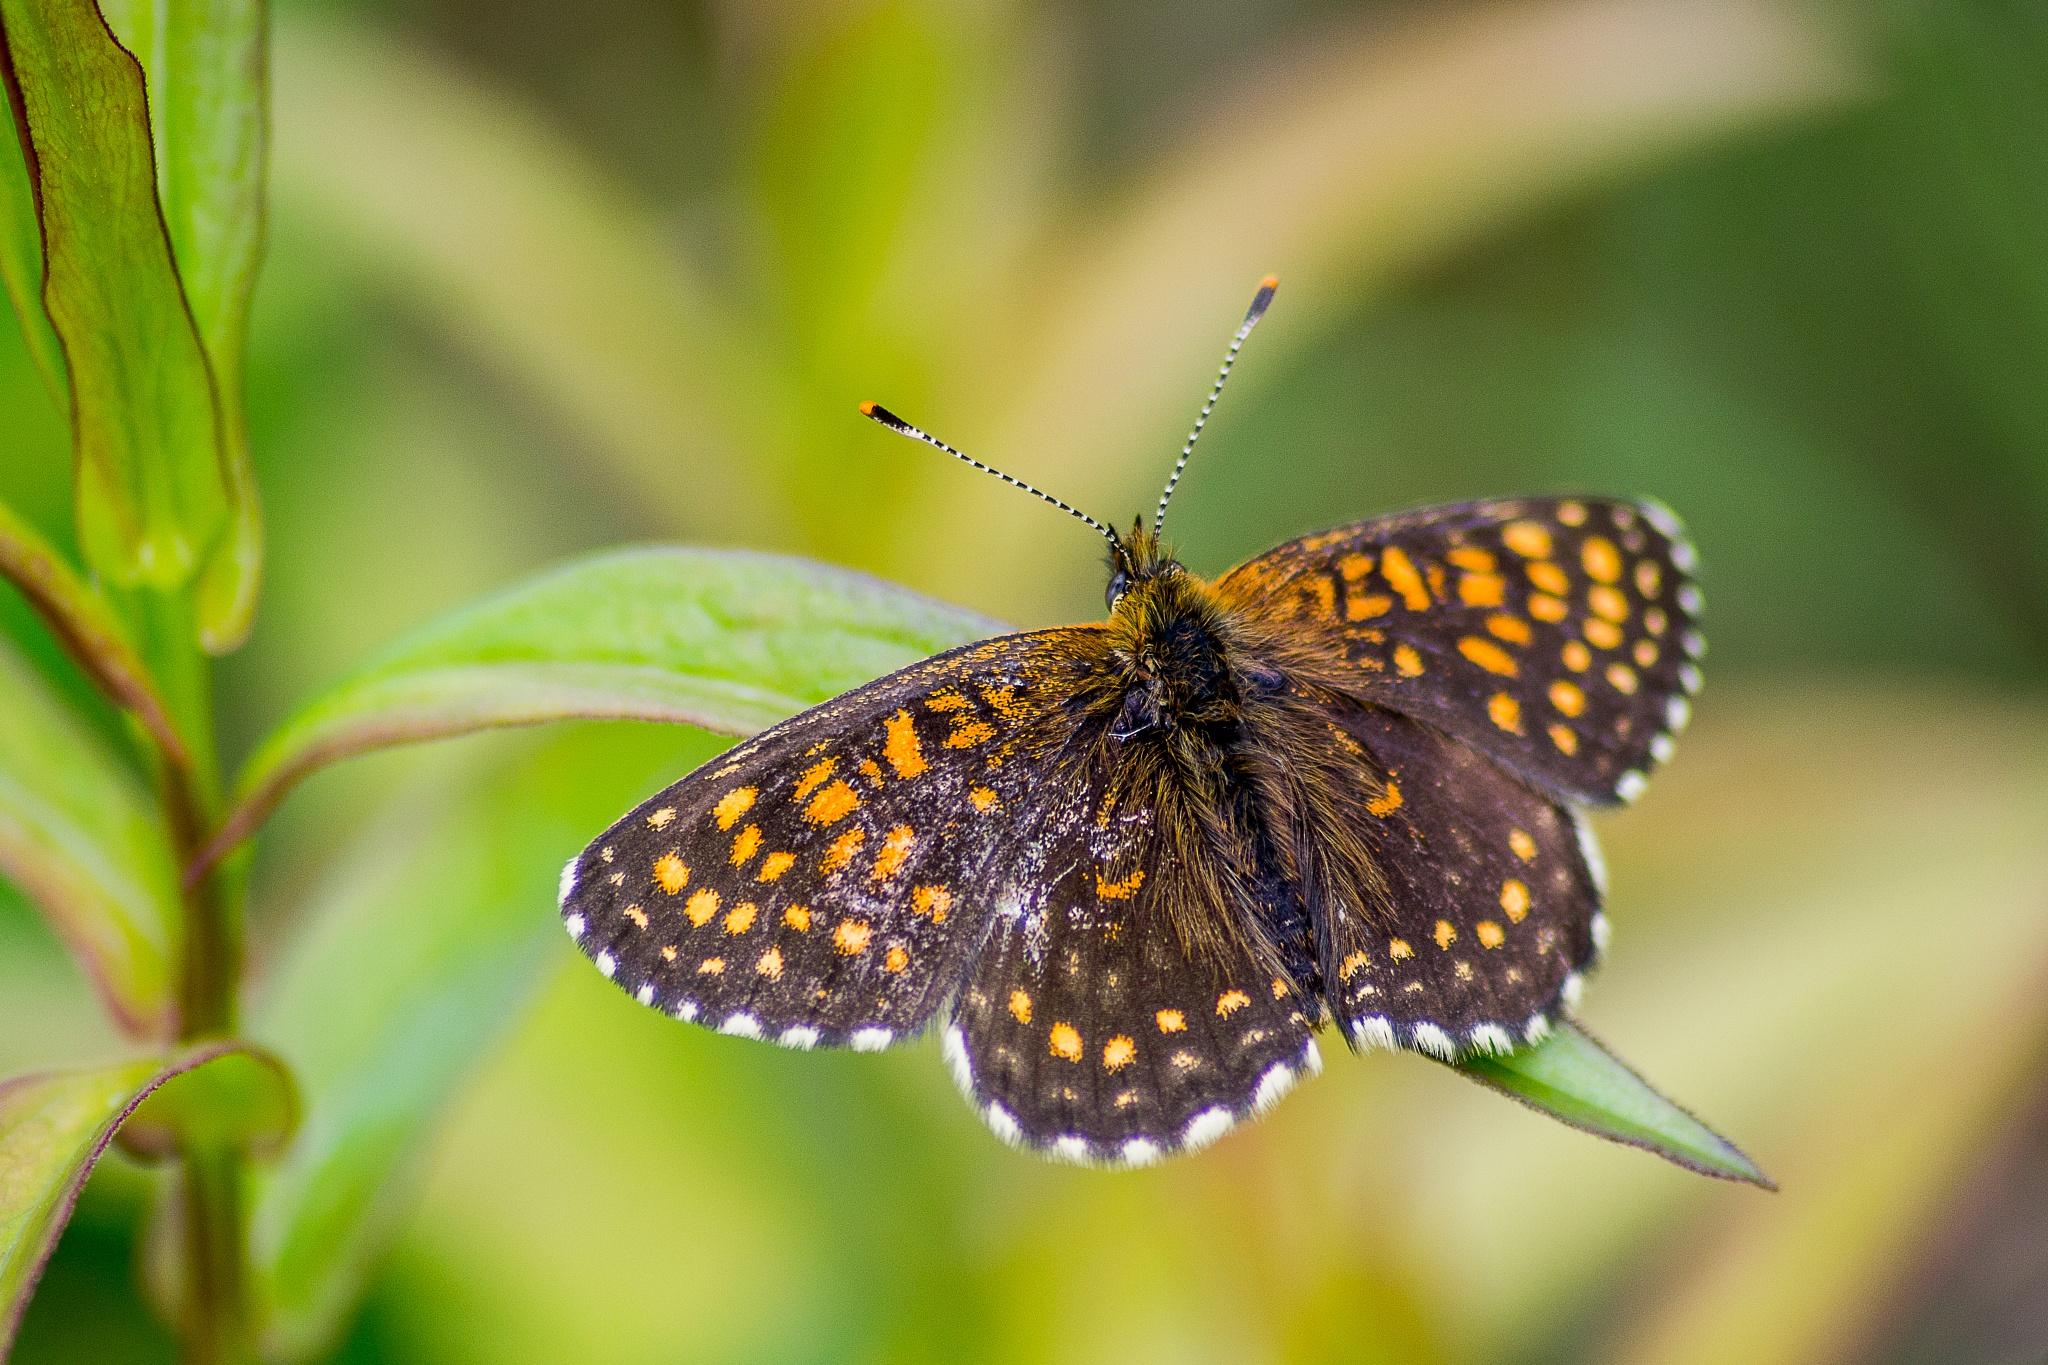 Butterfly by Kristine Dokane